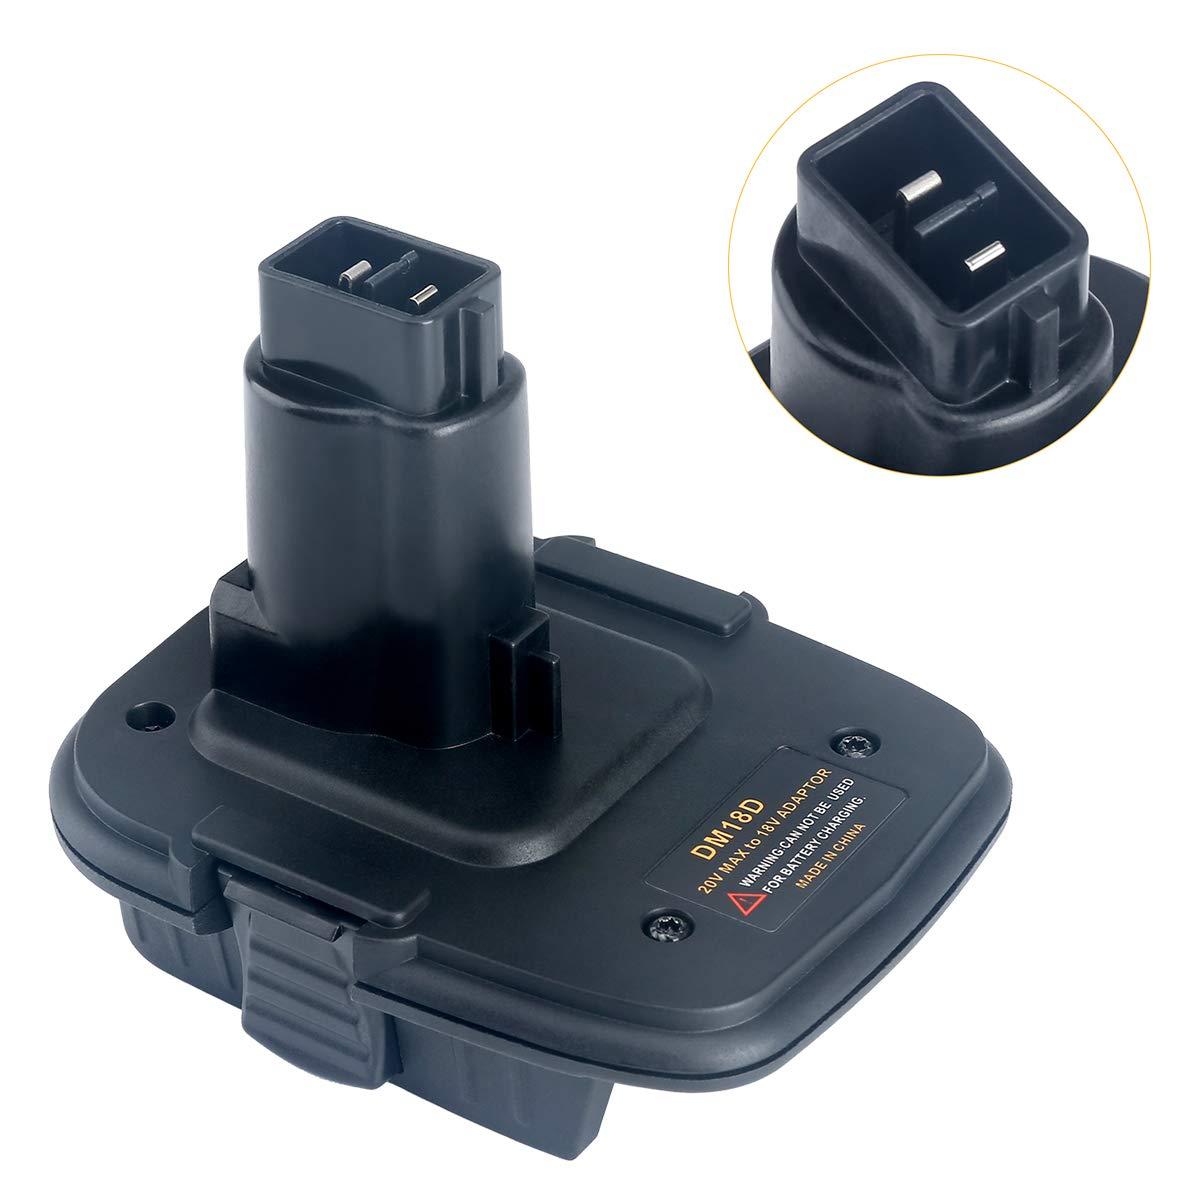 Lasica 20V Battery Adapter DCA1820 with USB port for Dewalt 18V Tools, Convert Milwaukee 18V Lithium Battery M18 DeWalt MAX 20Volt Lithium-Ion Battery DCB204 to DeWalt 18V NiCad NiMh Battery DC9096 by Lasica (Image #2)